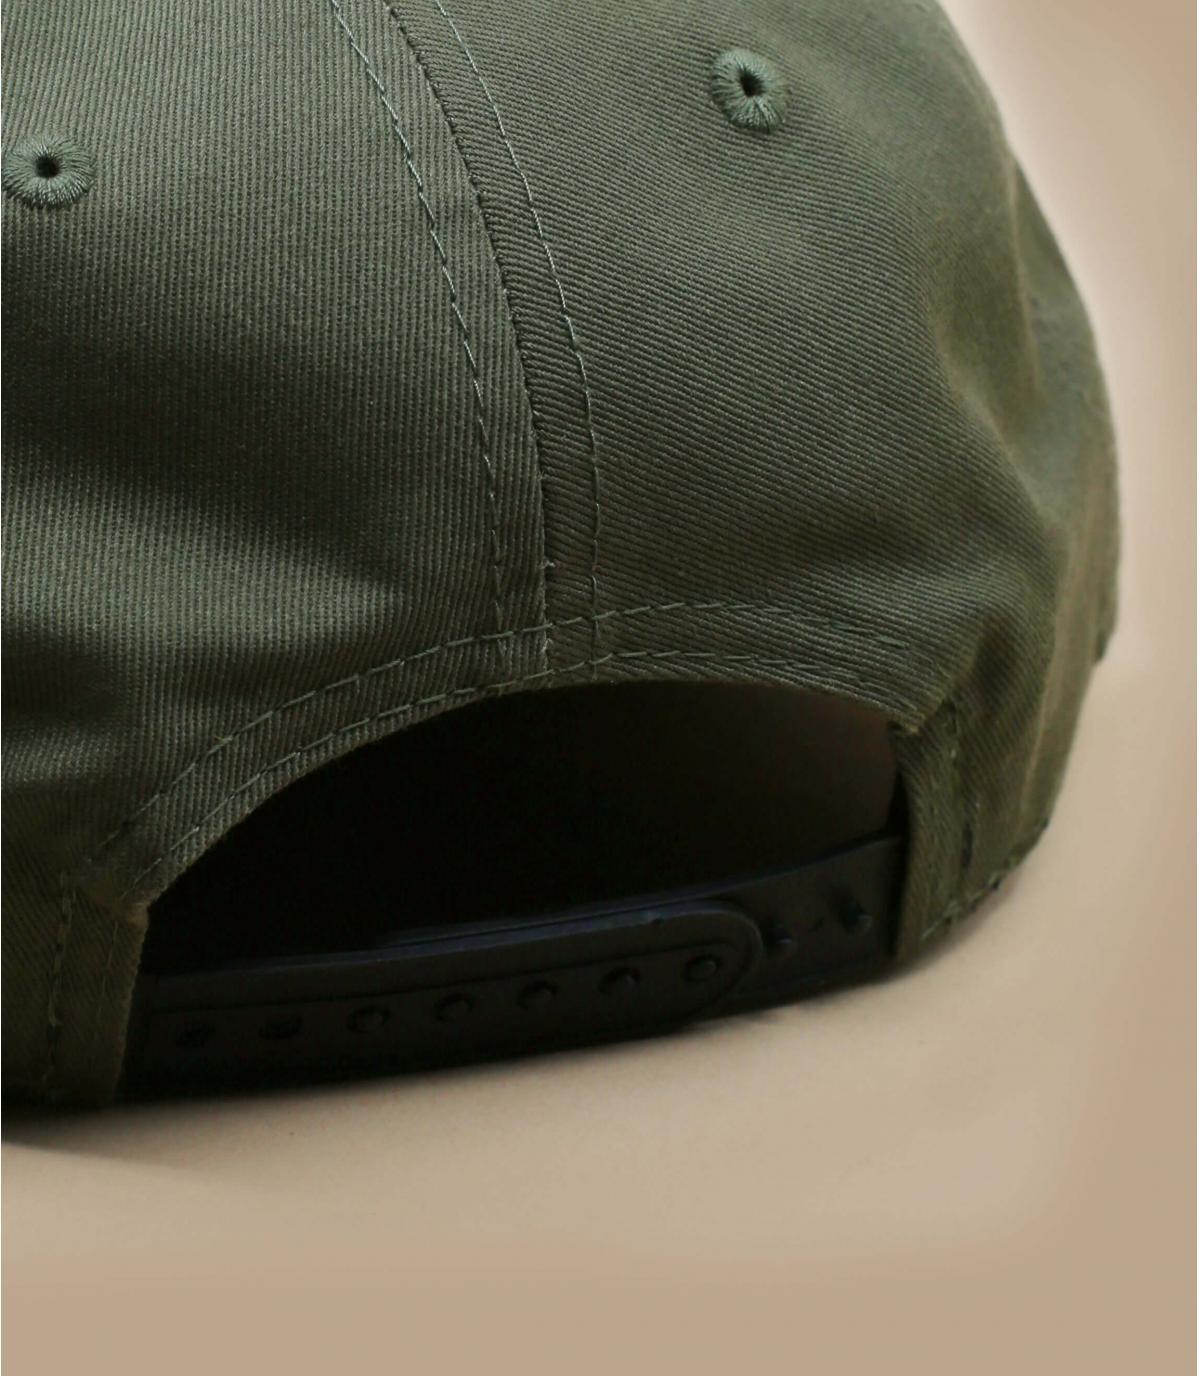 Details Snapback Colour Block NY 950 olive black - Abbildung 4